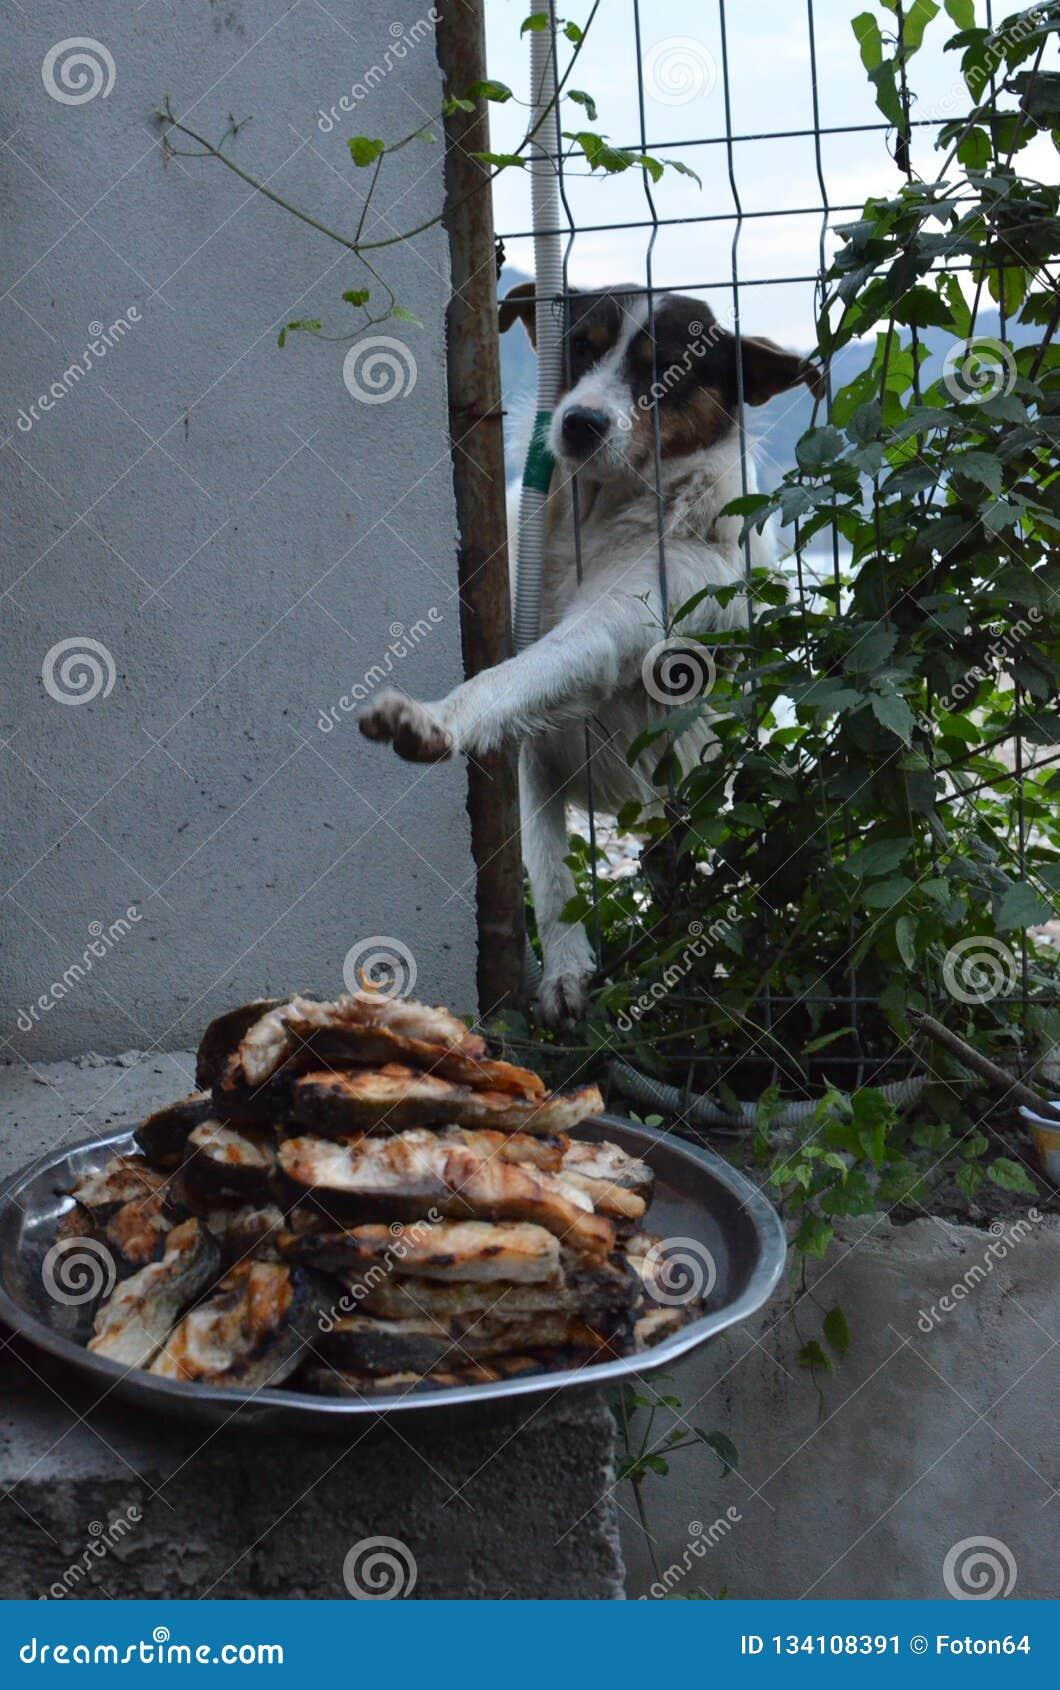 Hungry stray dog wants food